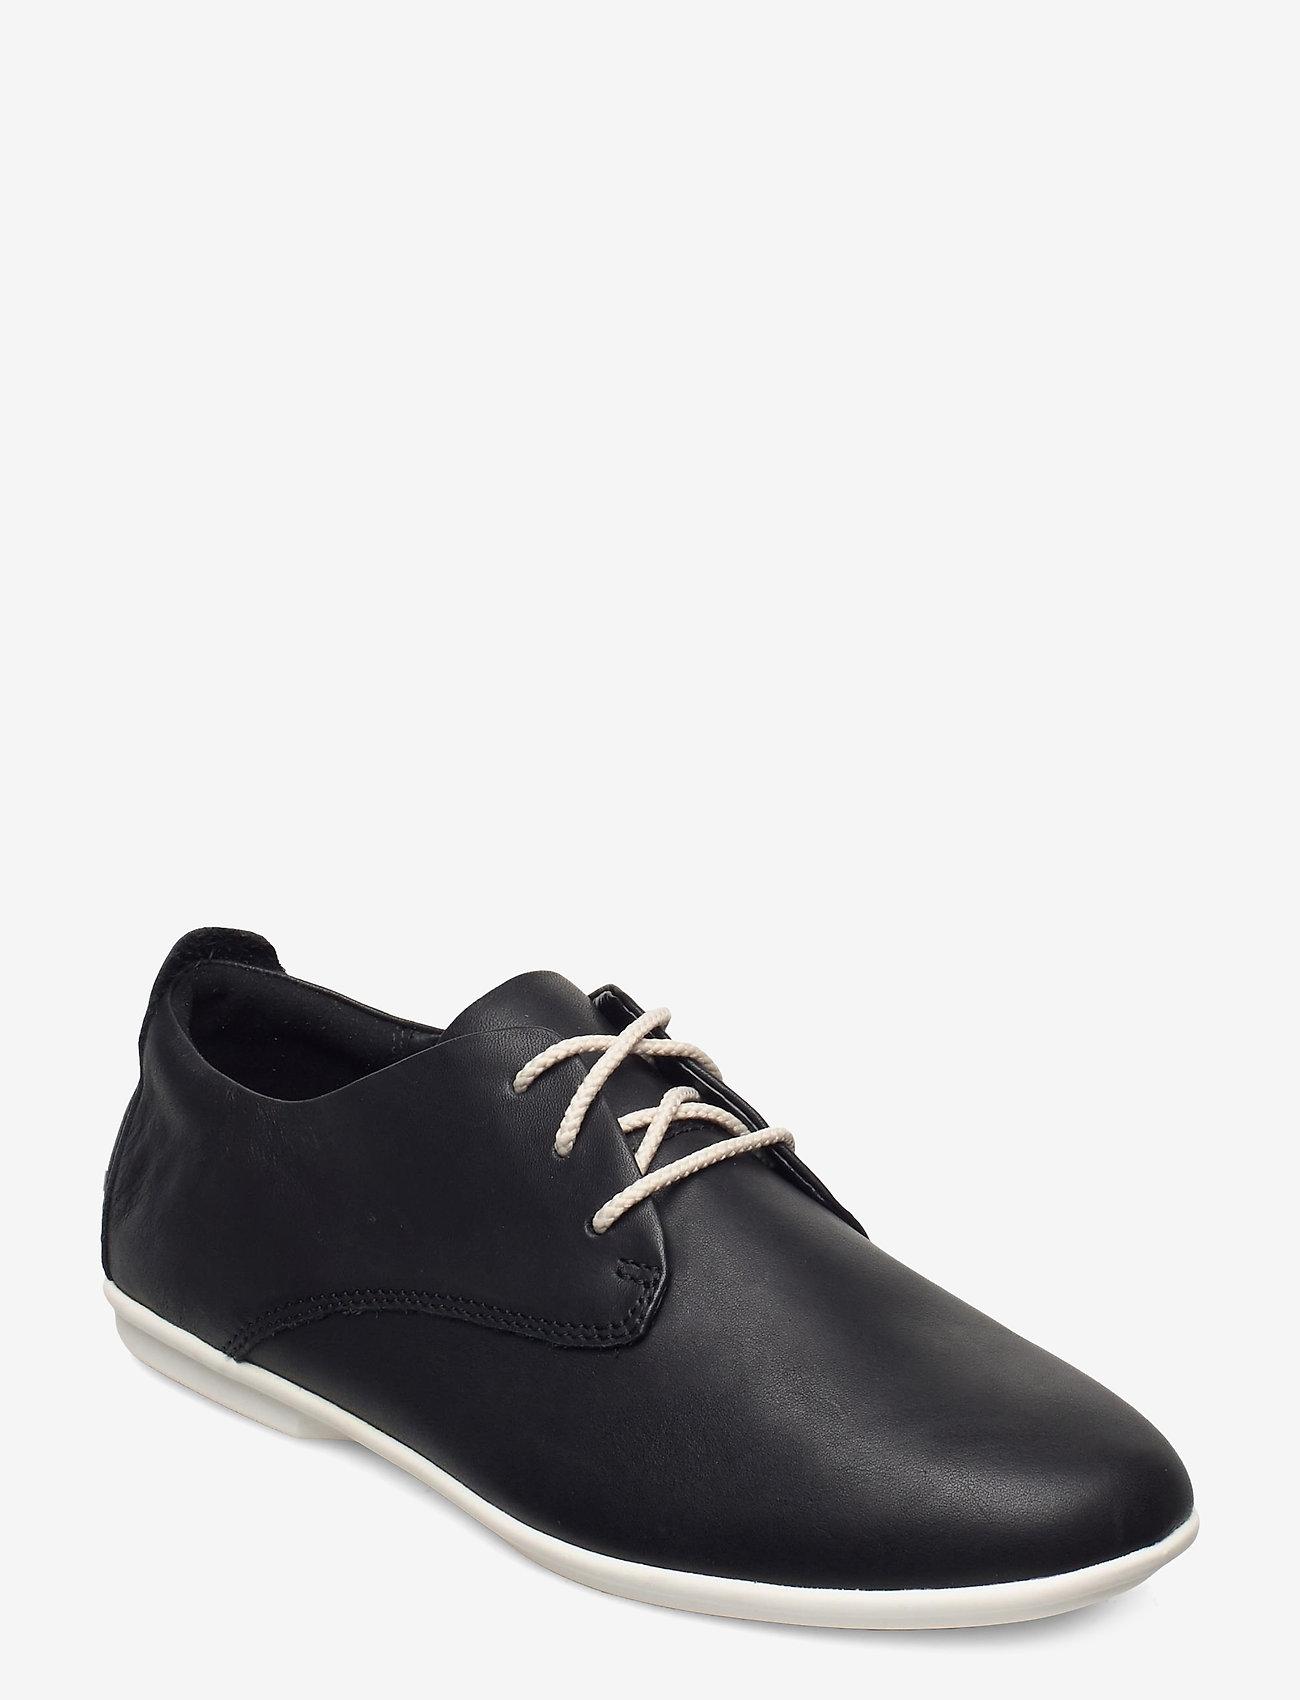 Clarks - Un Coral Lace - snörskor - black leather - 0